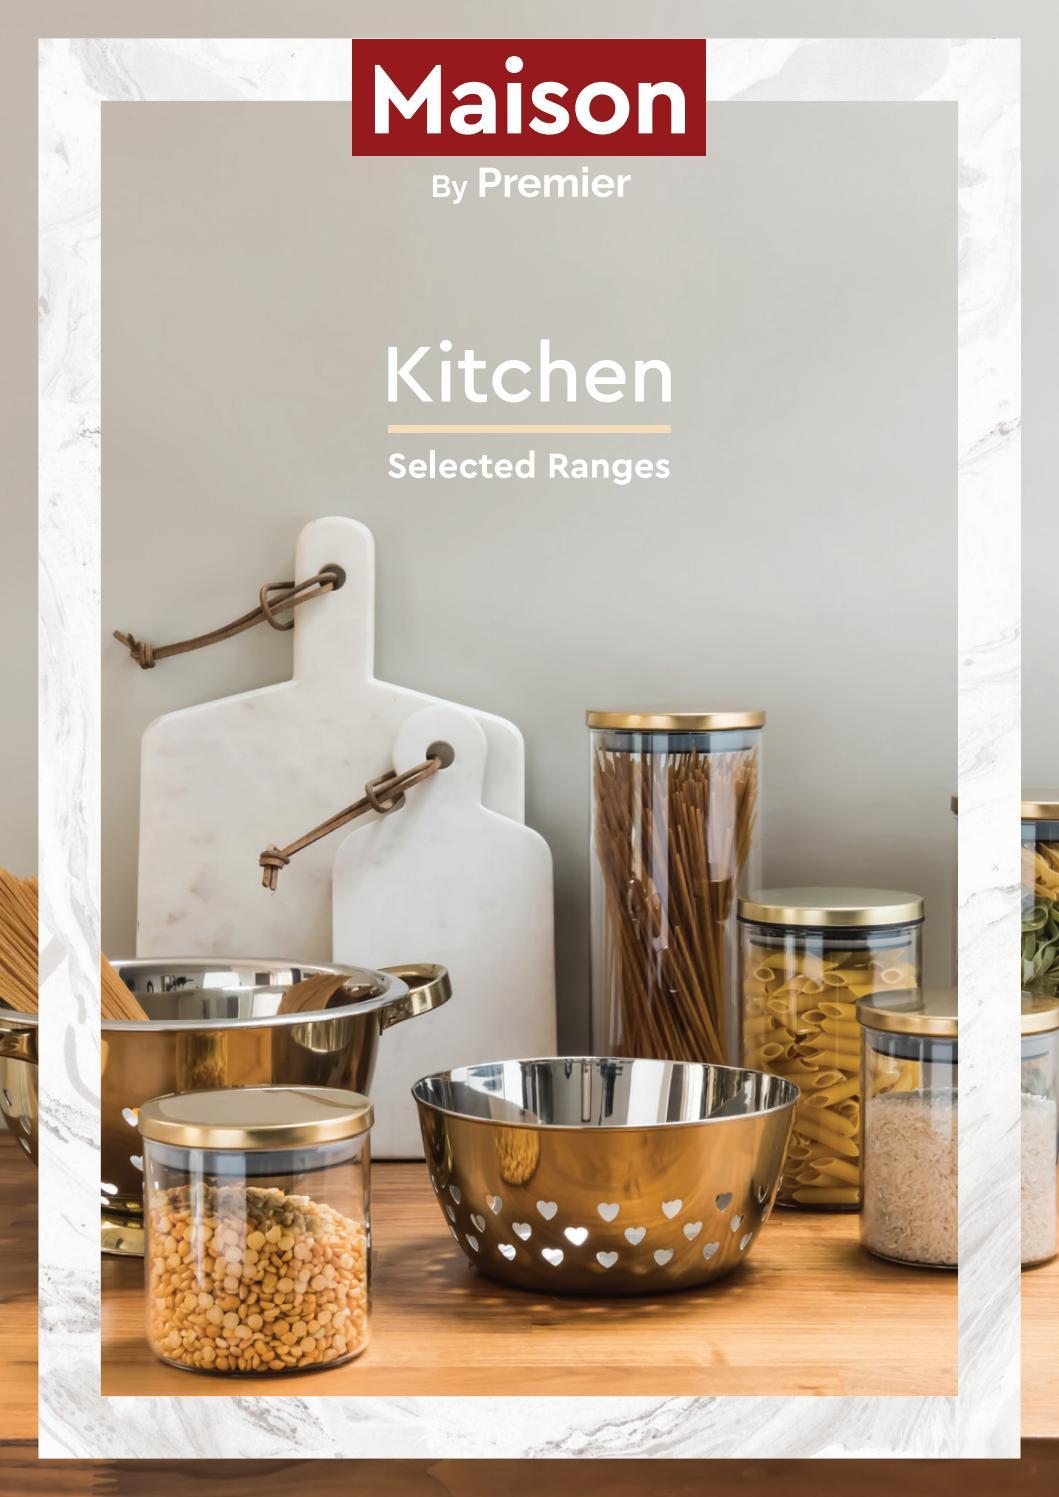 Black Stoneware Kitchen OvenLove Casserole Dish 1.4 Ltr with Lid